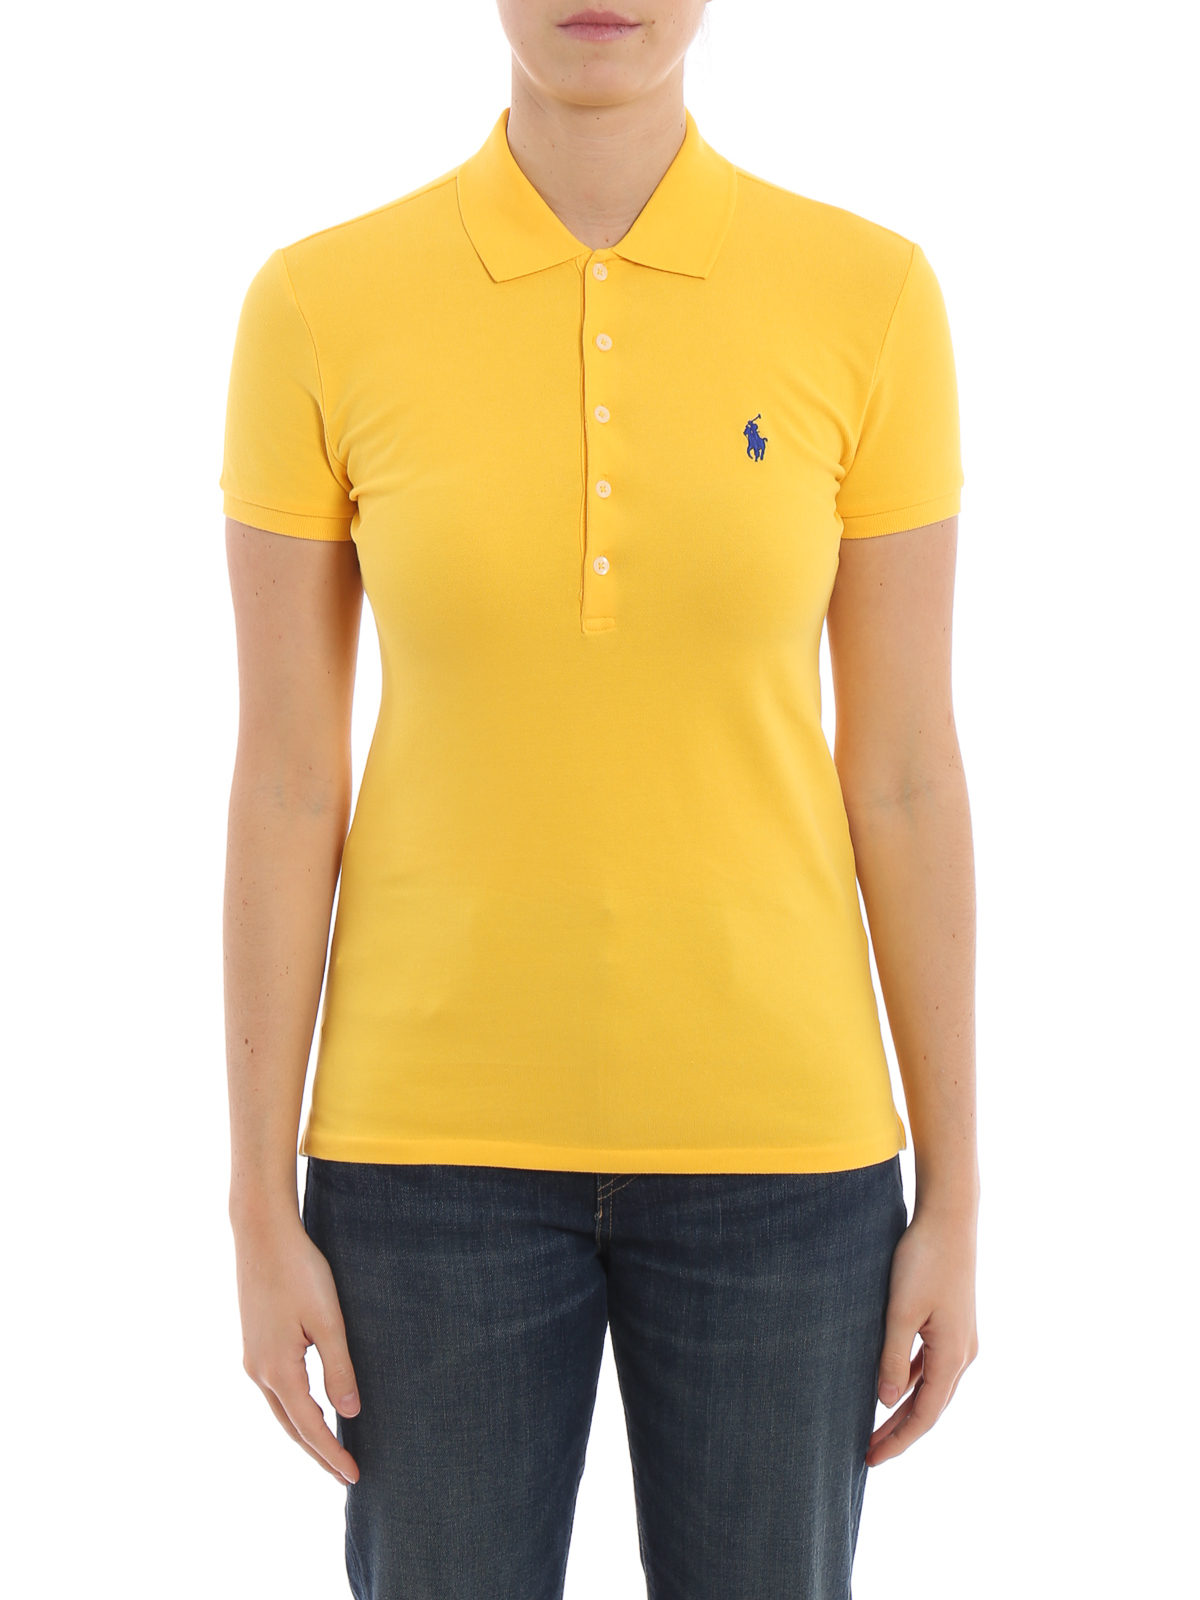 polo ralph lauren slim fit yellow cotton polo shirt. Black Bedroom Furniture Sets. Home Design Ideas